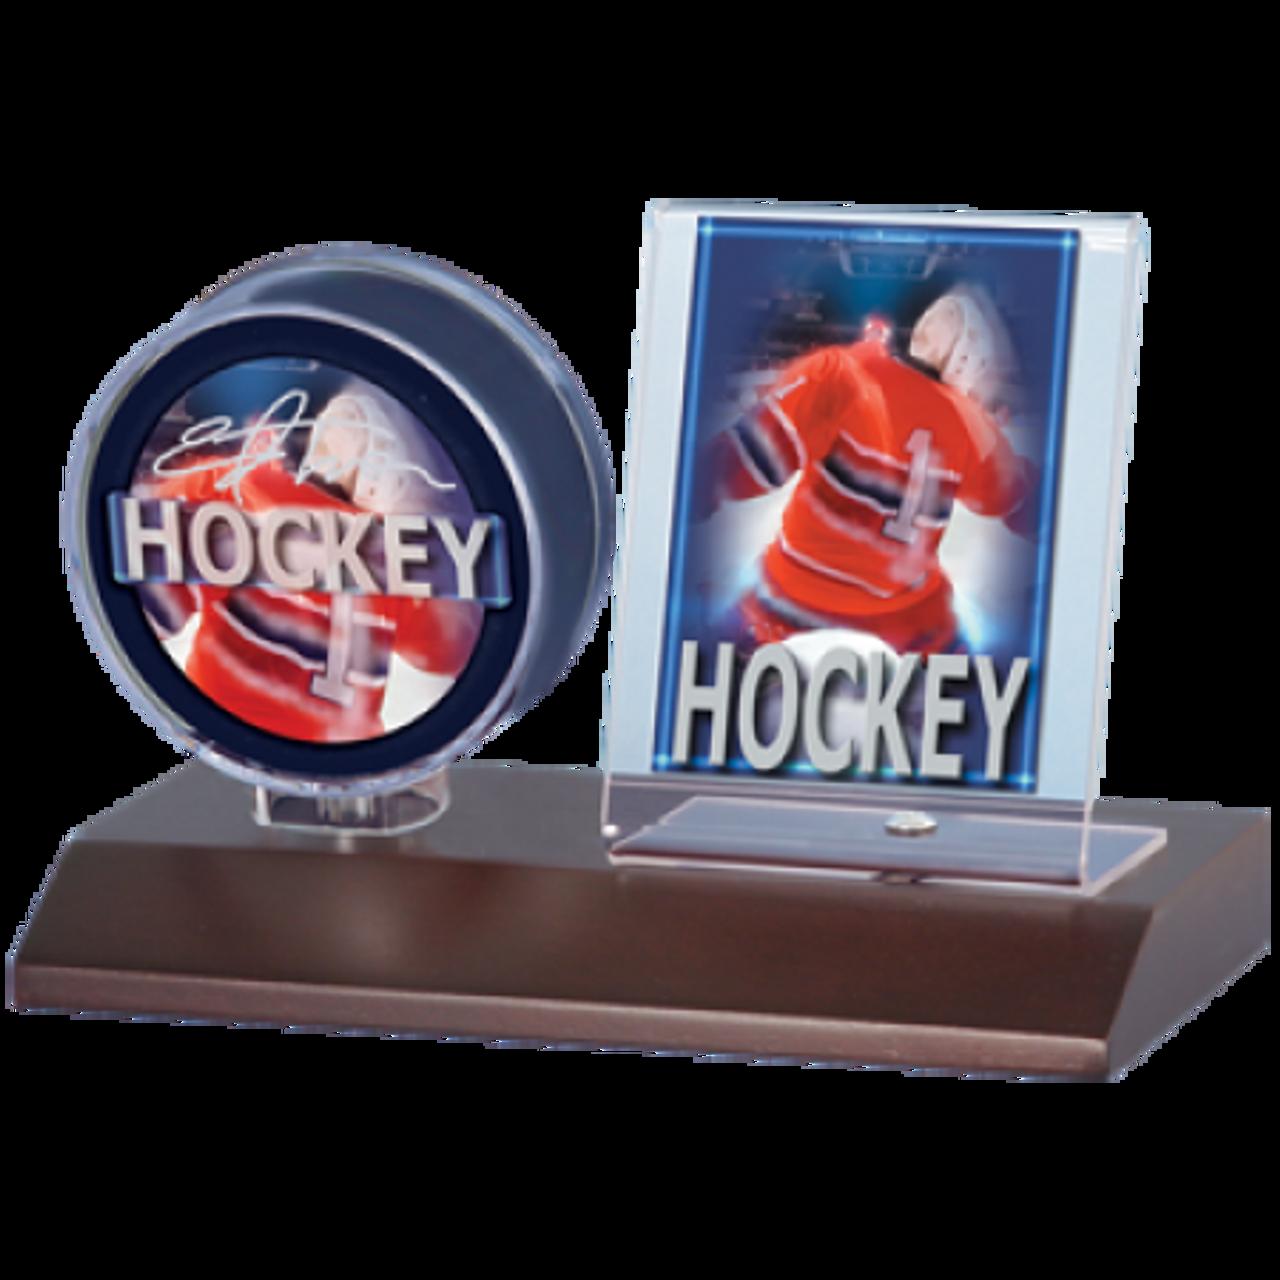 Wood Hockey Puck & Card Holder - Dark Wood - Special Order